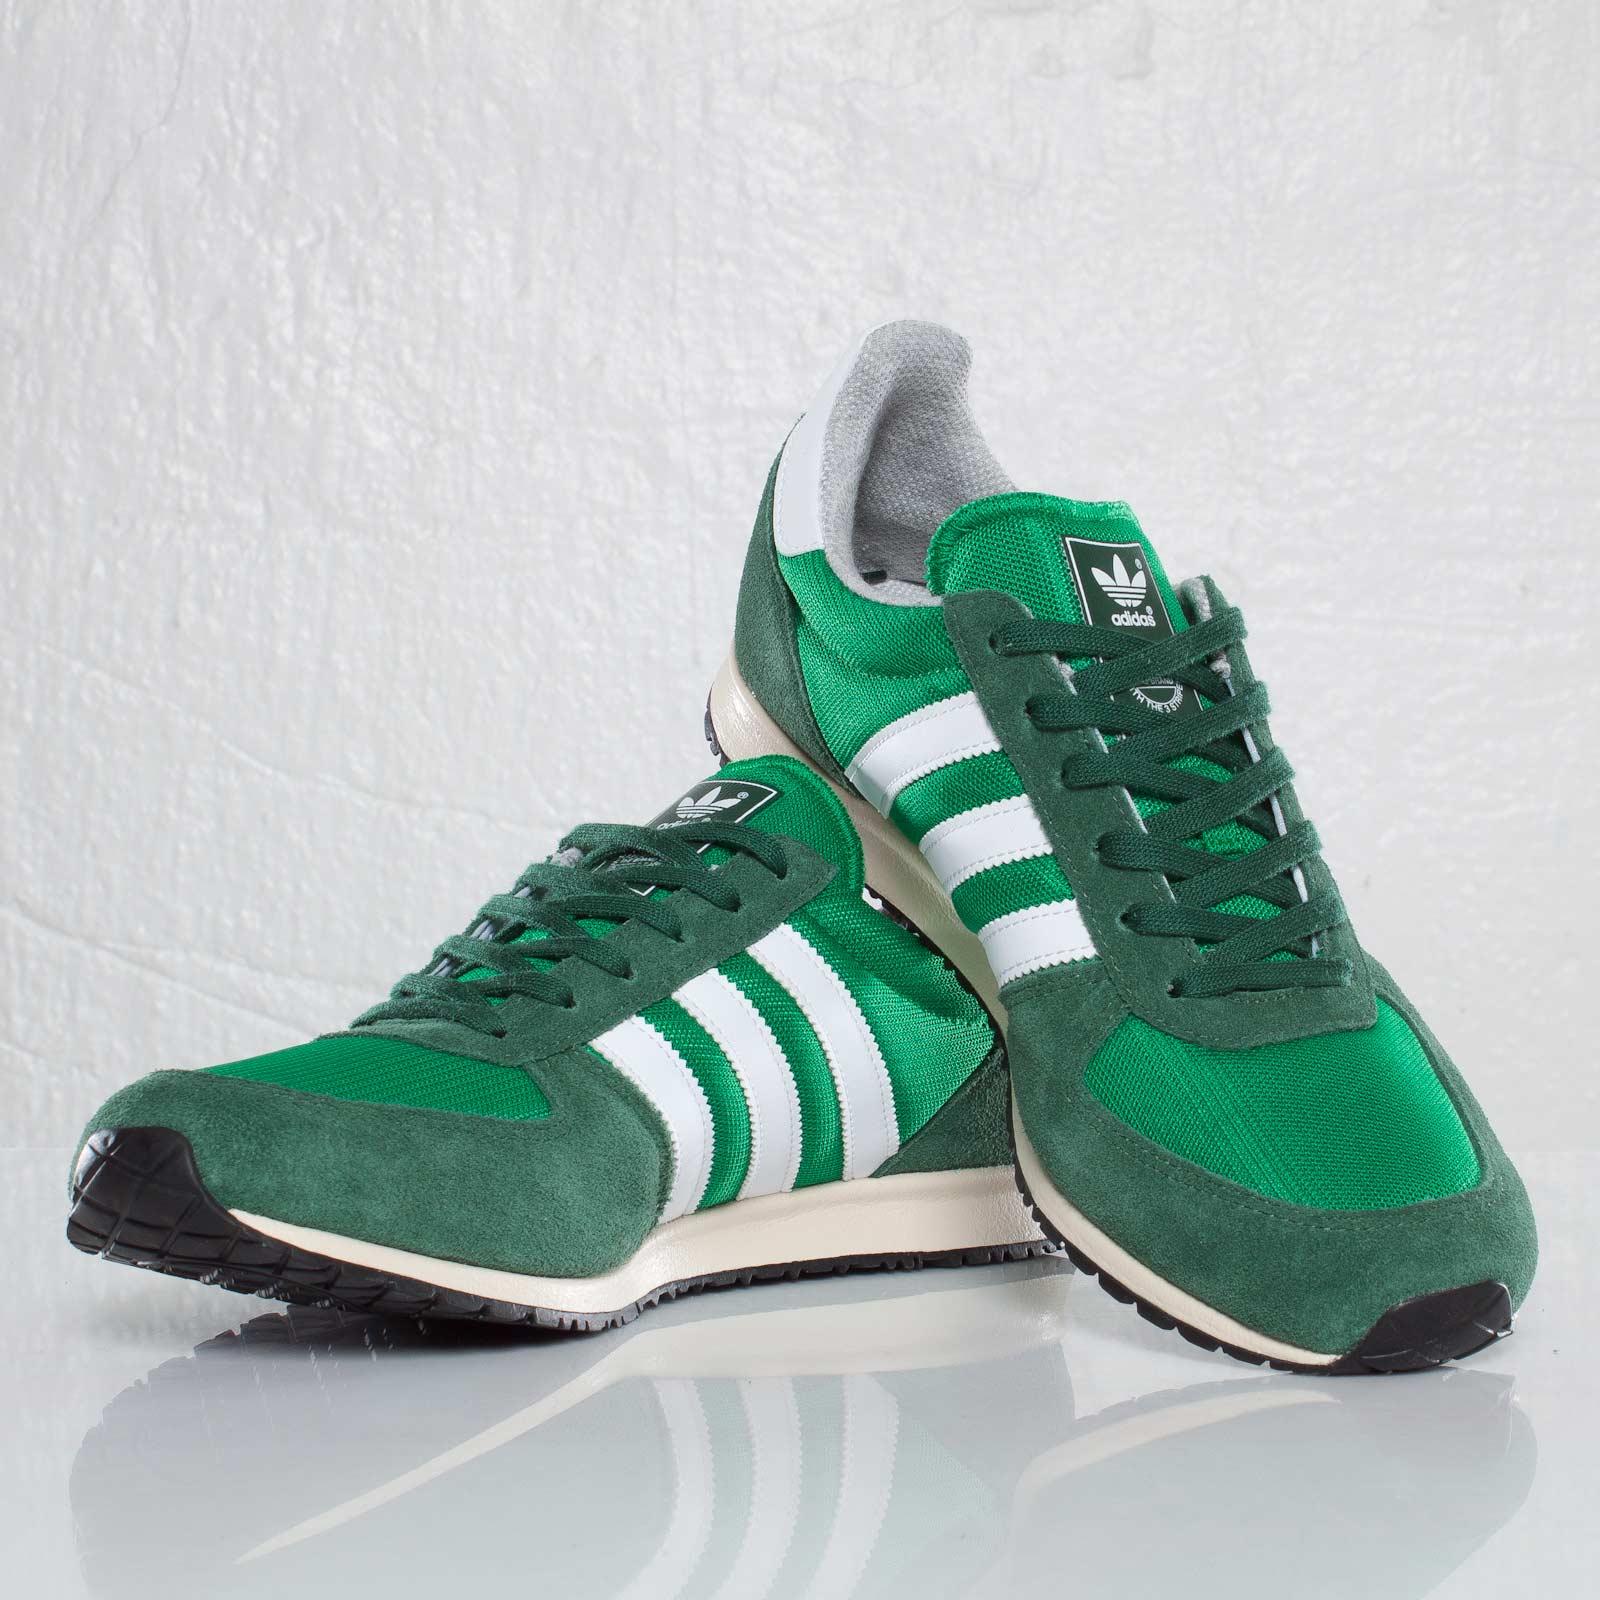 adidas Adistar Racer G61438 Sneakersnstuff | sneakers